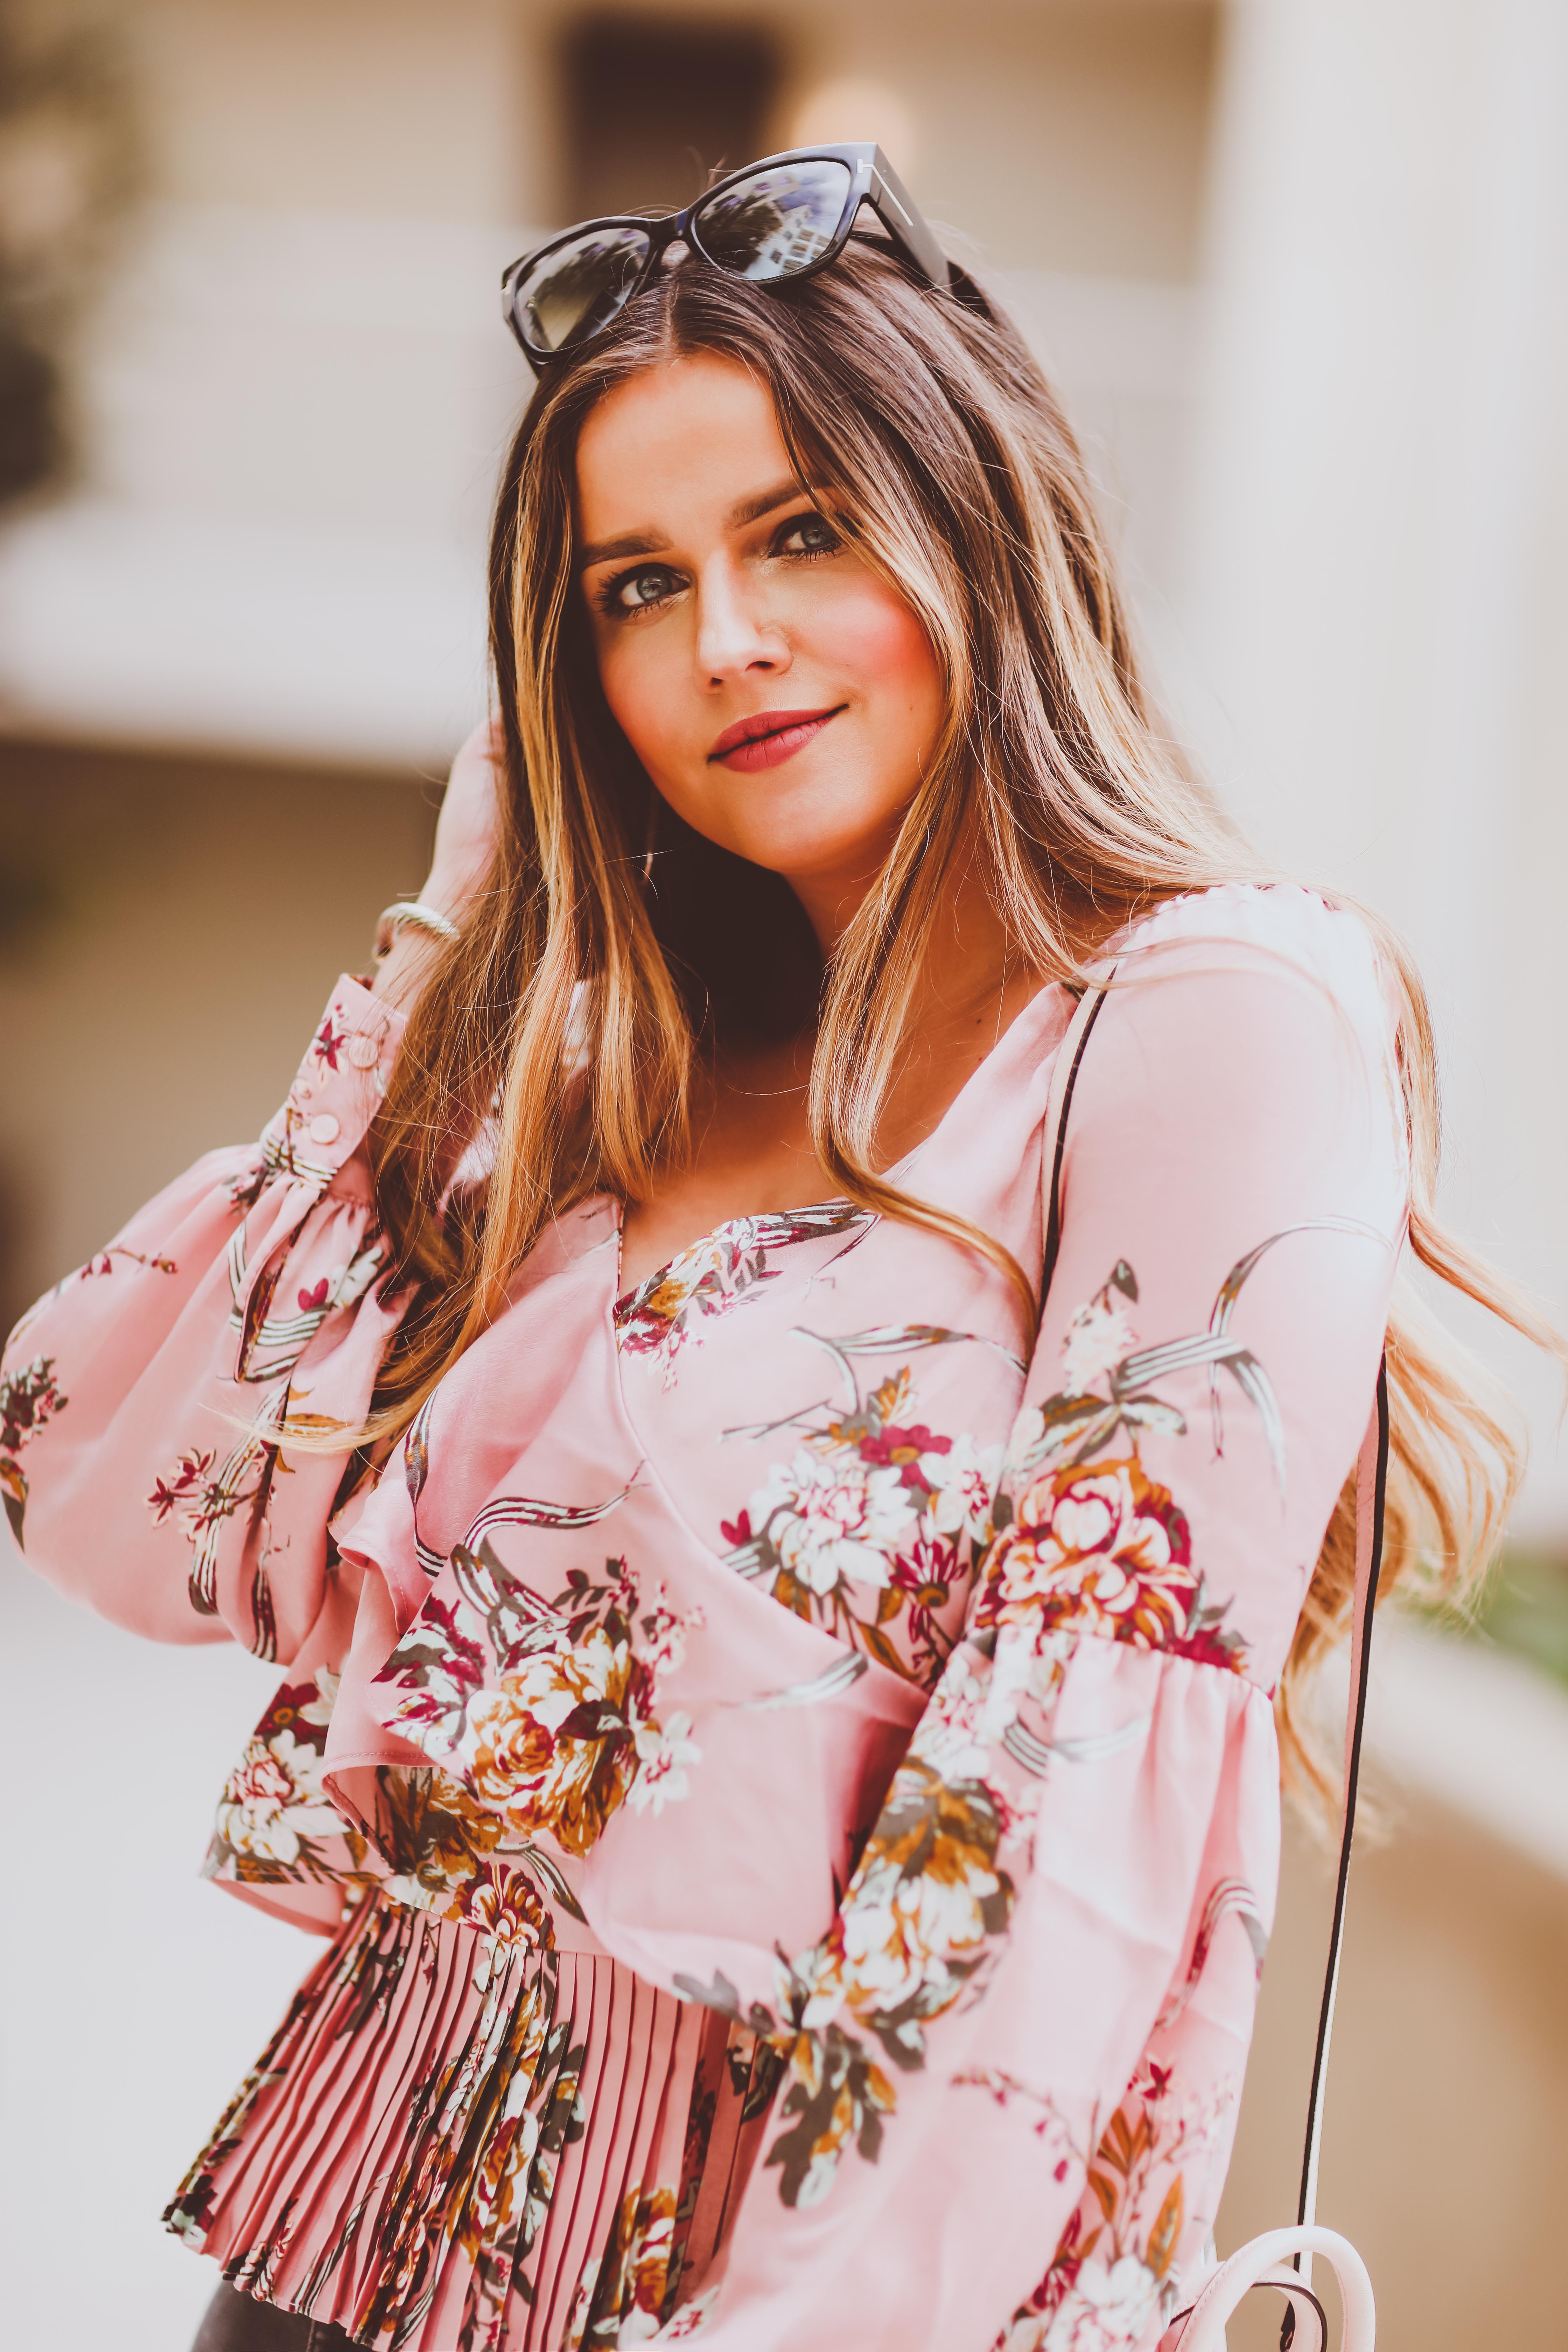 #OOTD // Pink Floral Ruffle Top & Grey Skinny Jeans | BondGirlGlam.com